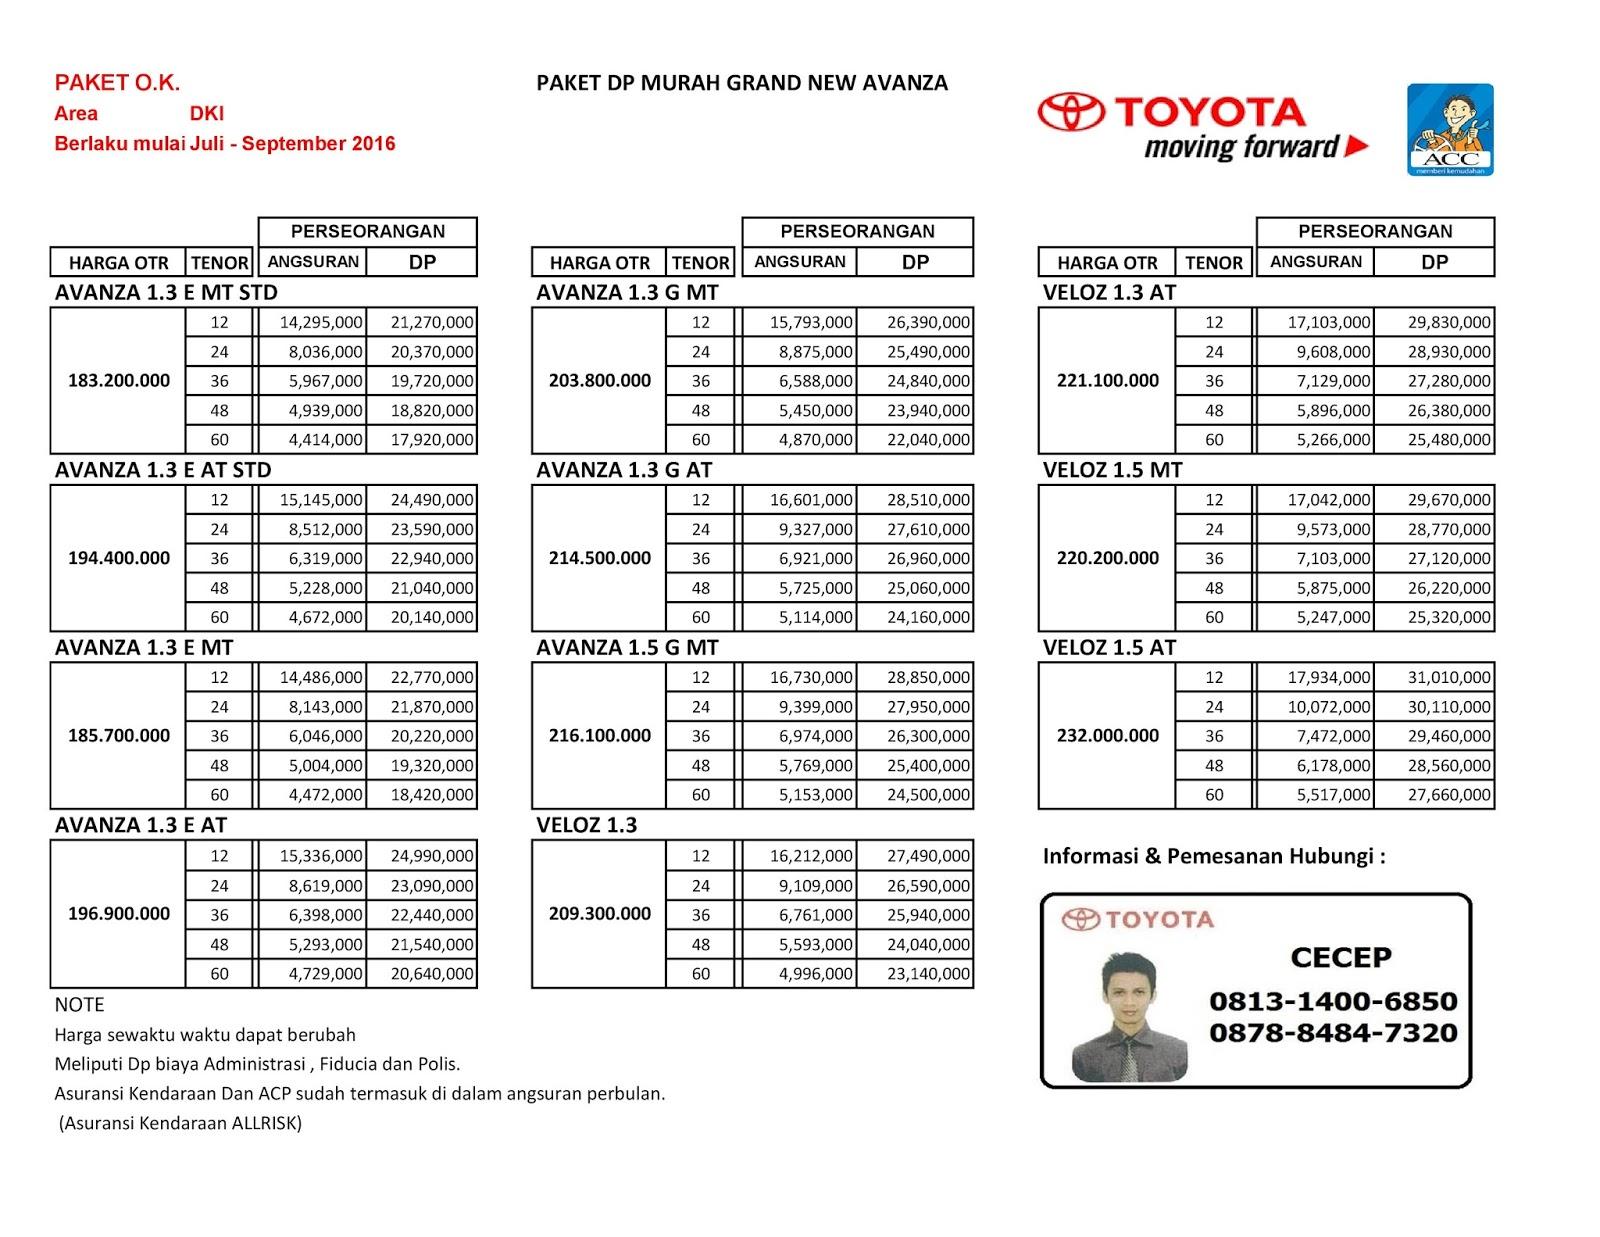 cicilan grand new avanza 1.3 g m/t 2017 paket kredit dp murah toyota lippo cikarang dan per agustus 2016